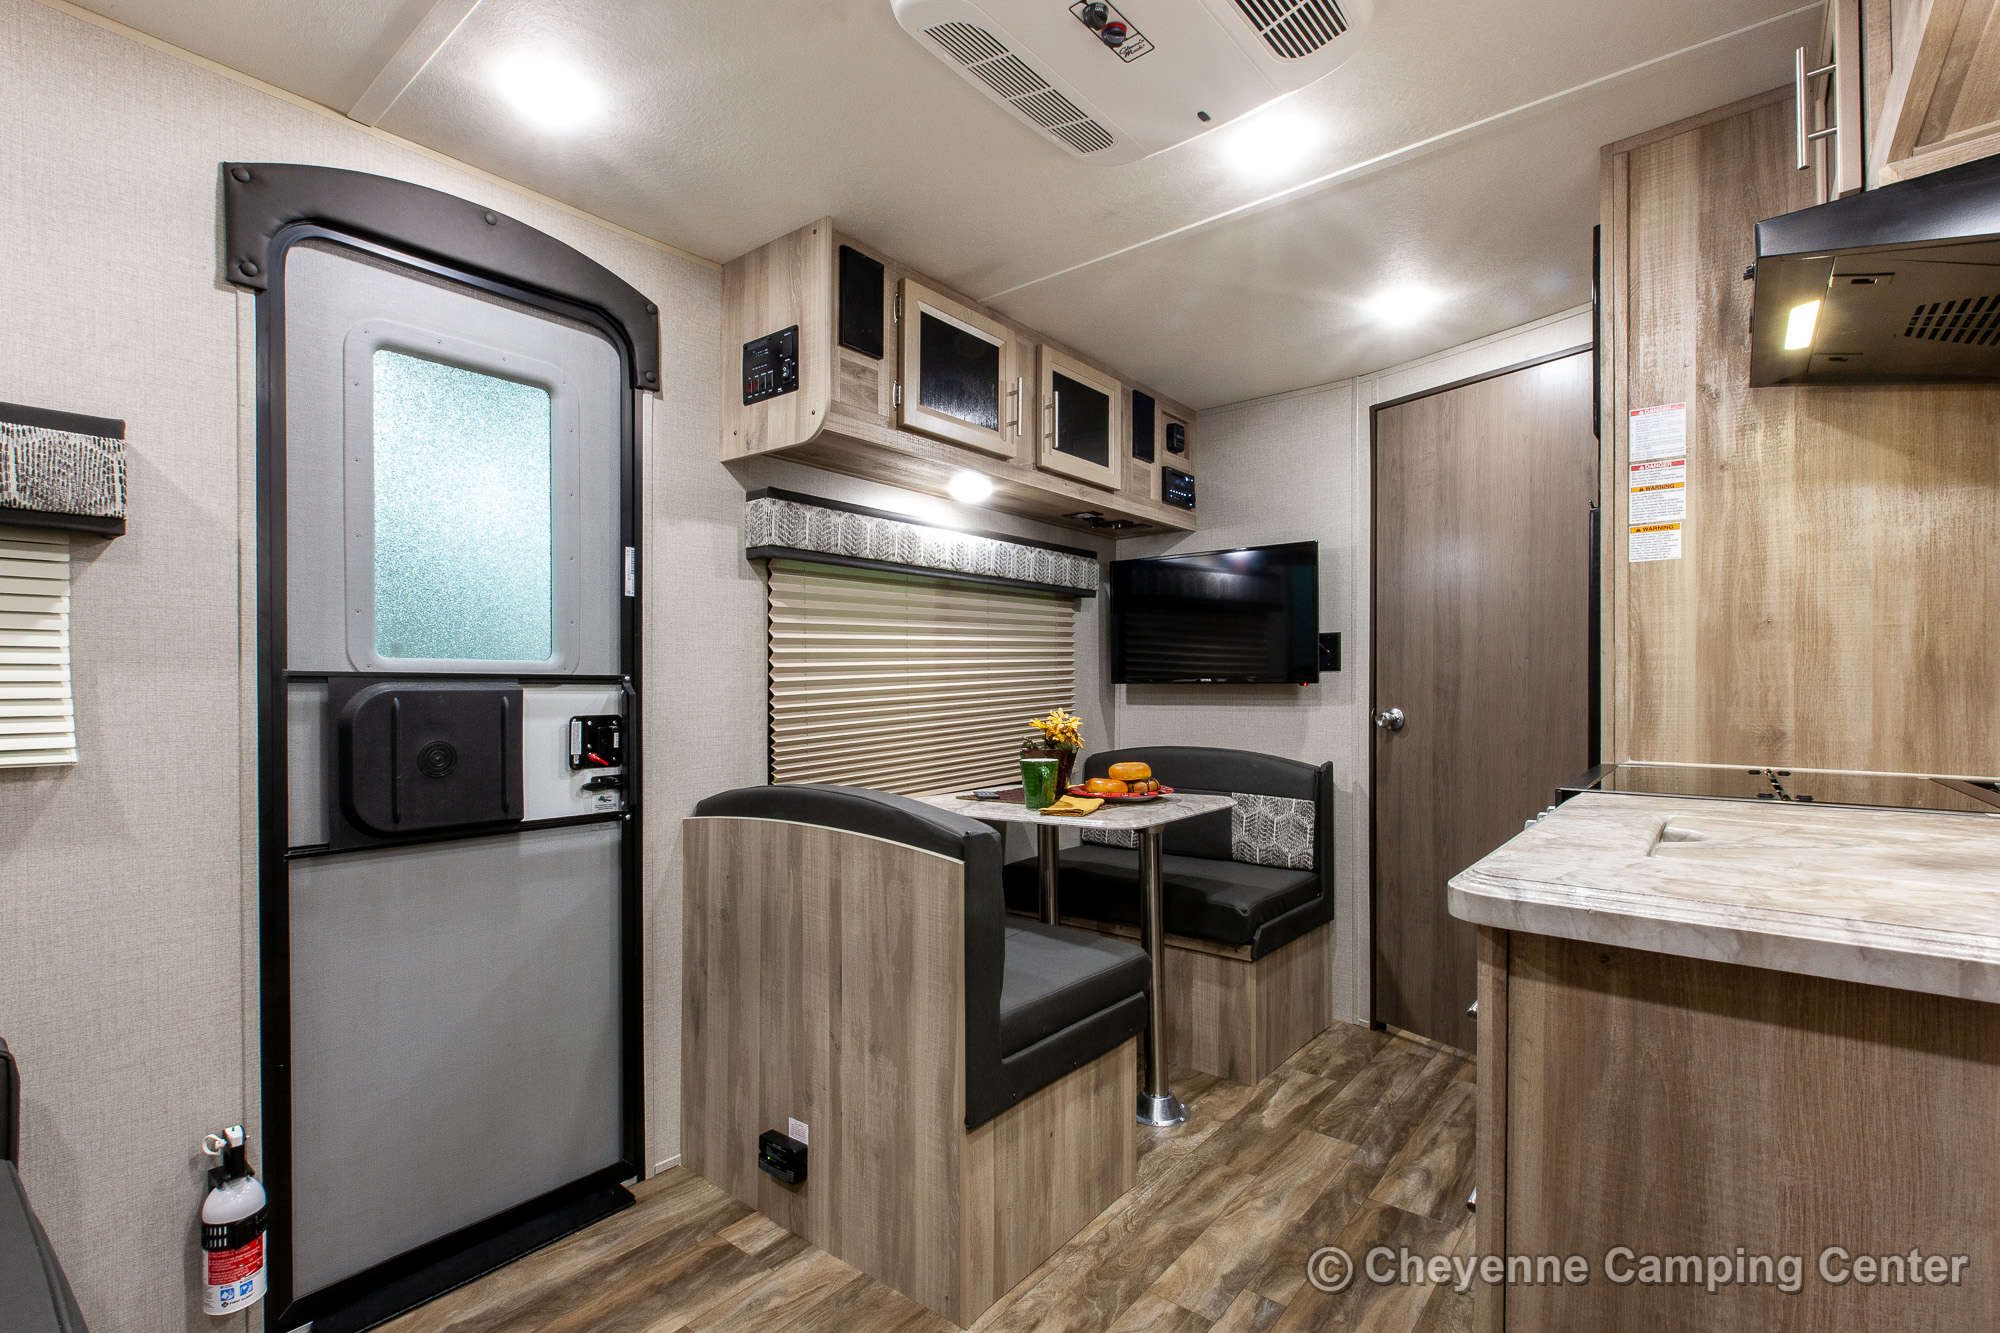 2021 Coachmen  Catalina Expedition 192RB Travel Trailer Interior Image